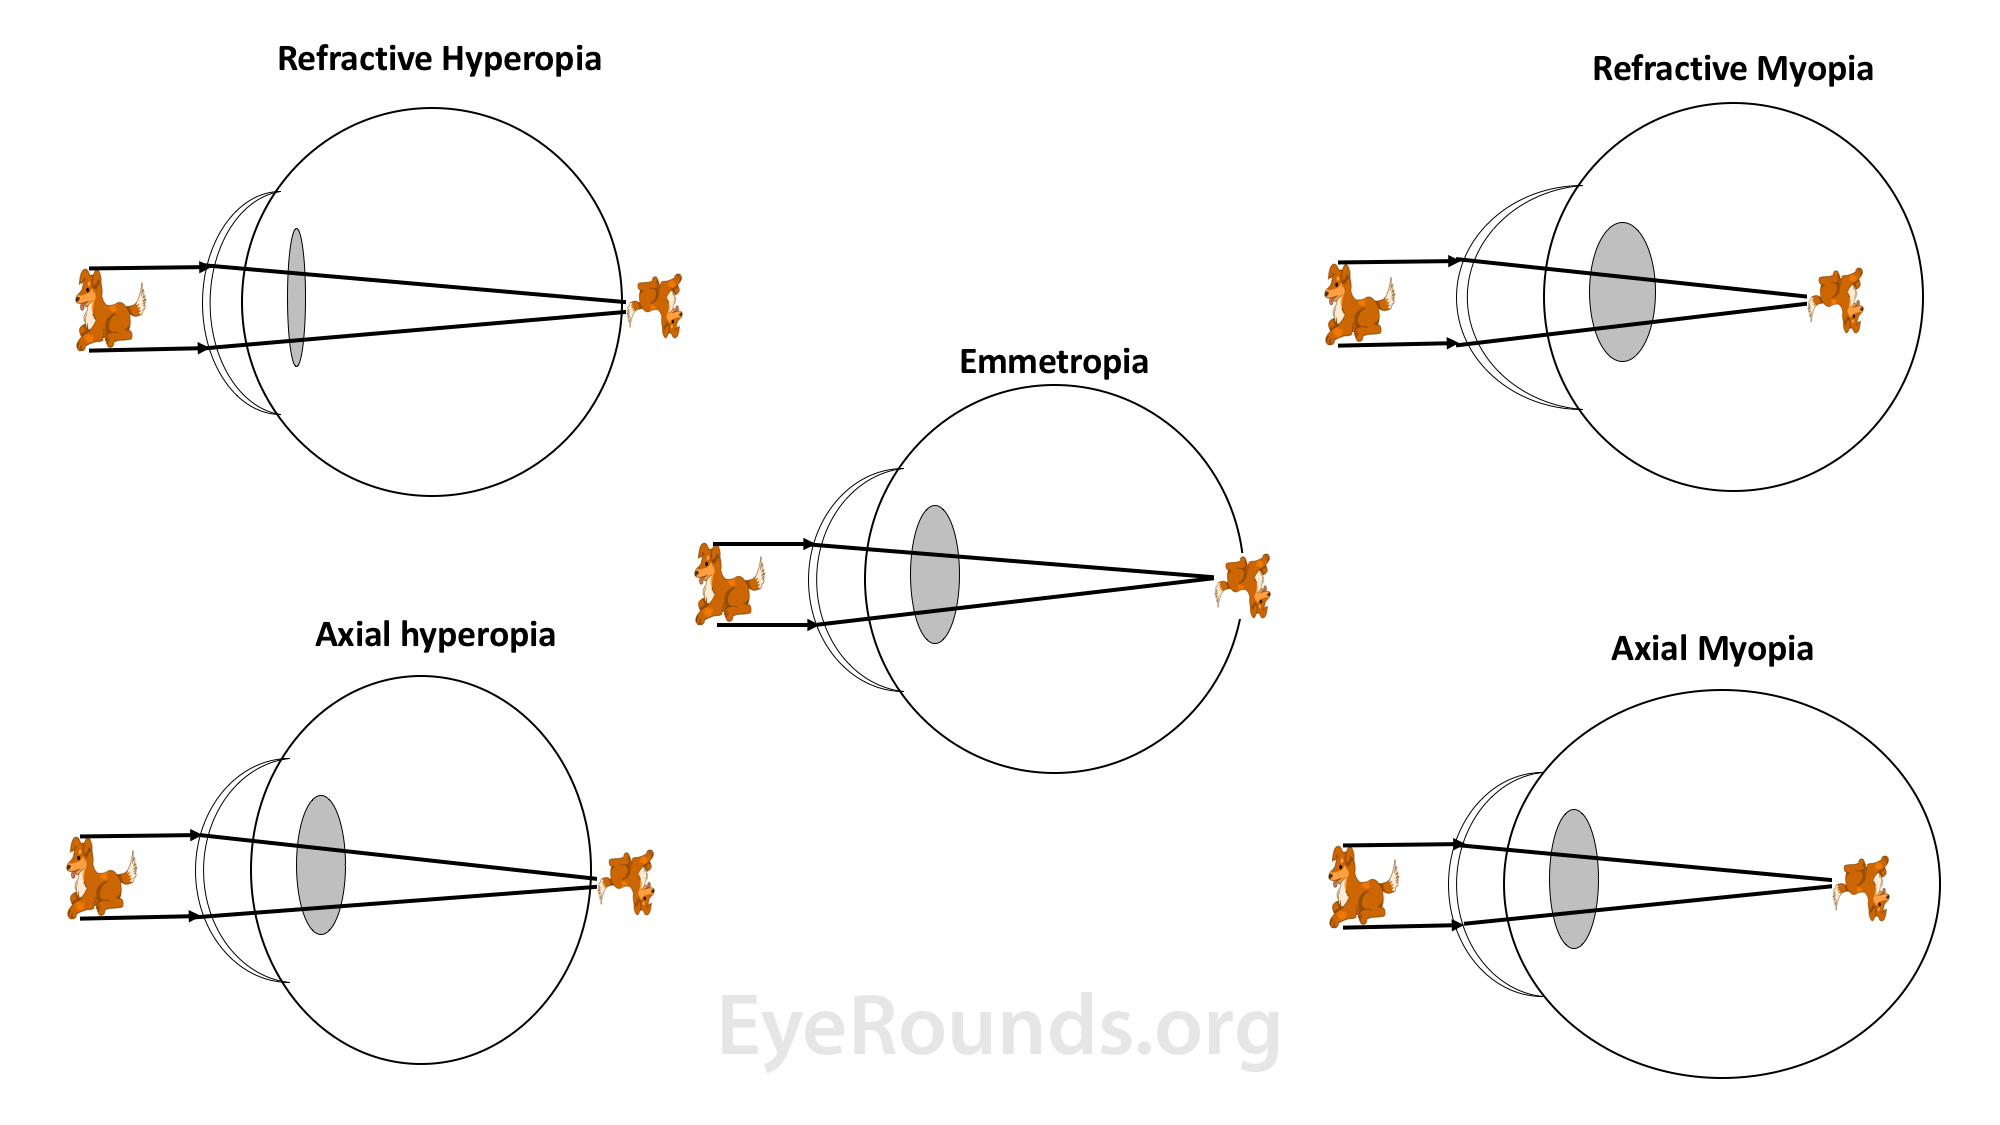 ha 3 myopia vagy hyperopia